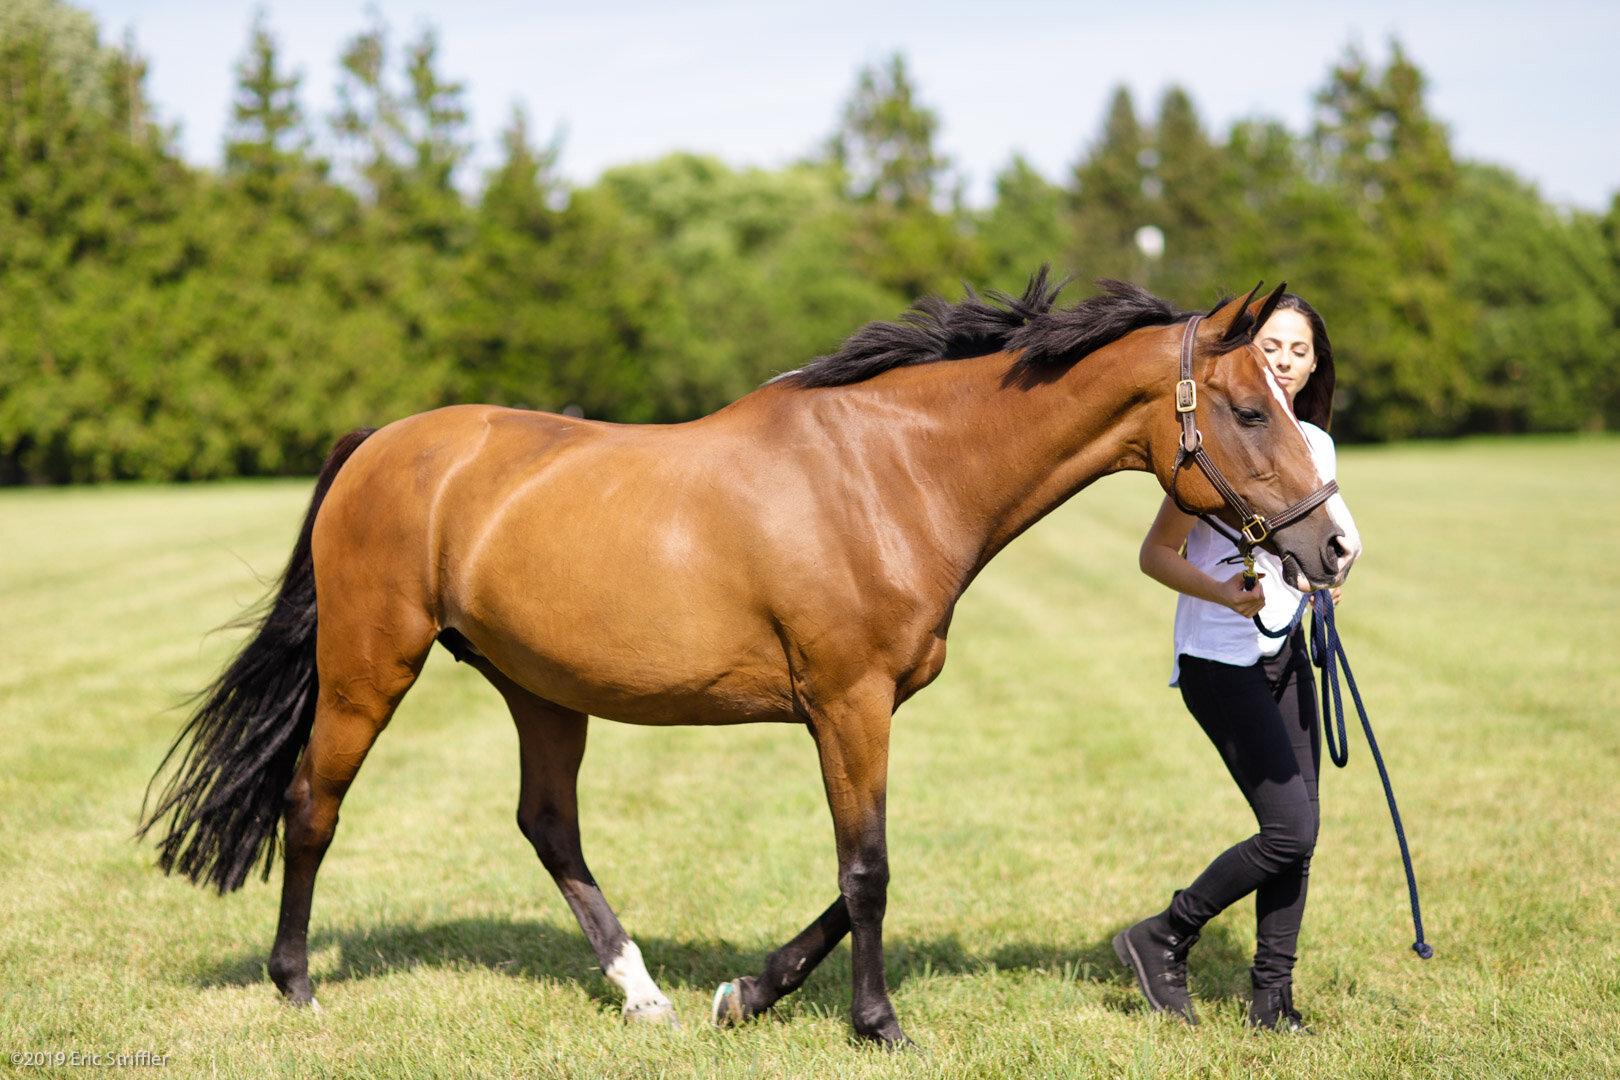 equestrian-fashion-photographer-portrait-lifestyle-0410.jpg